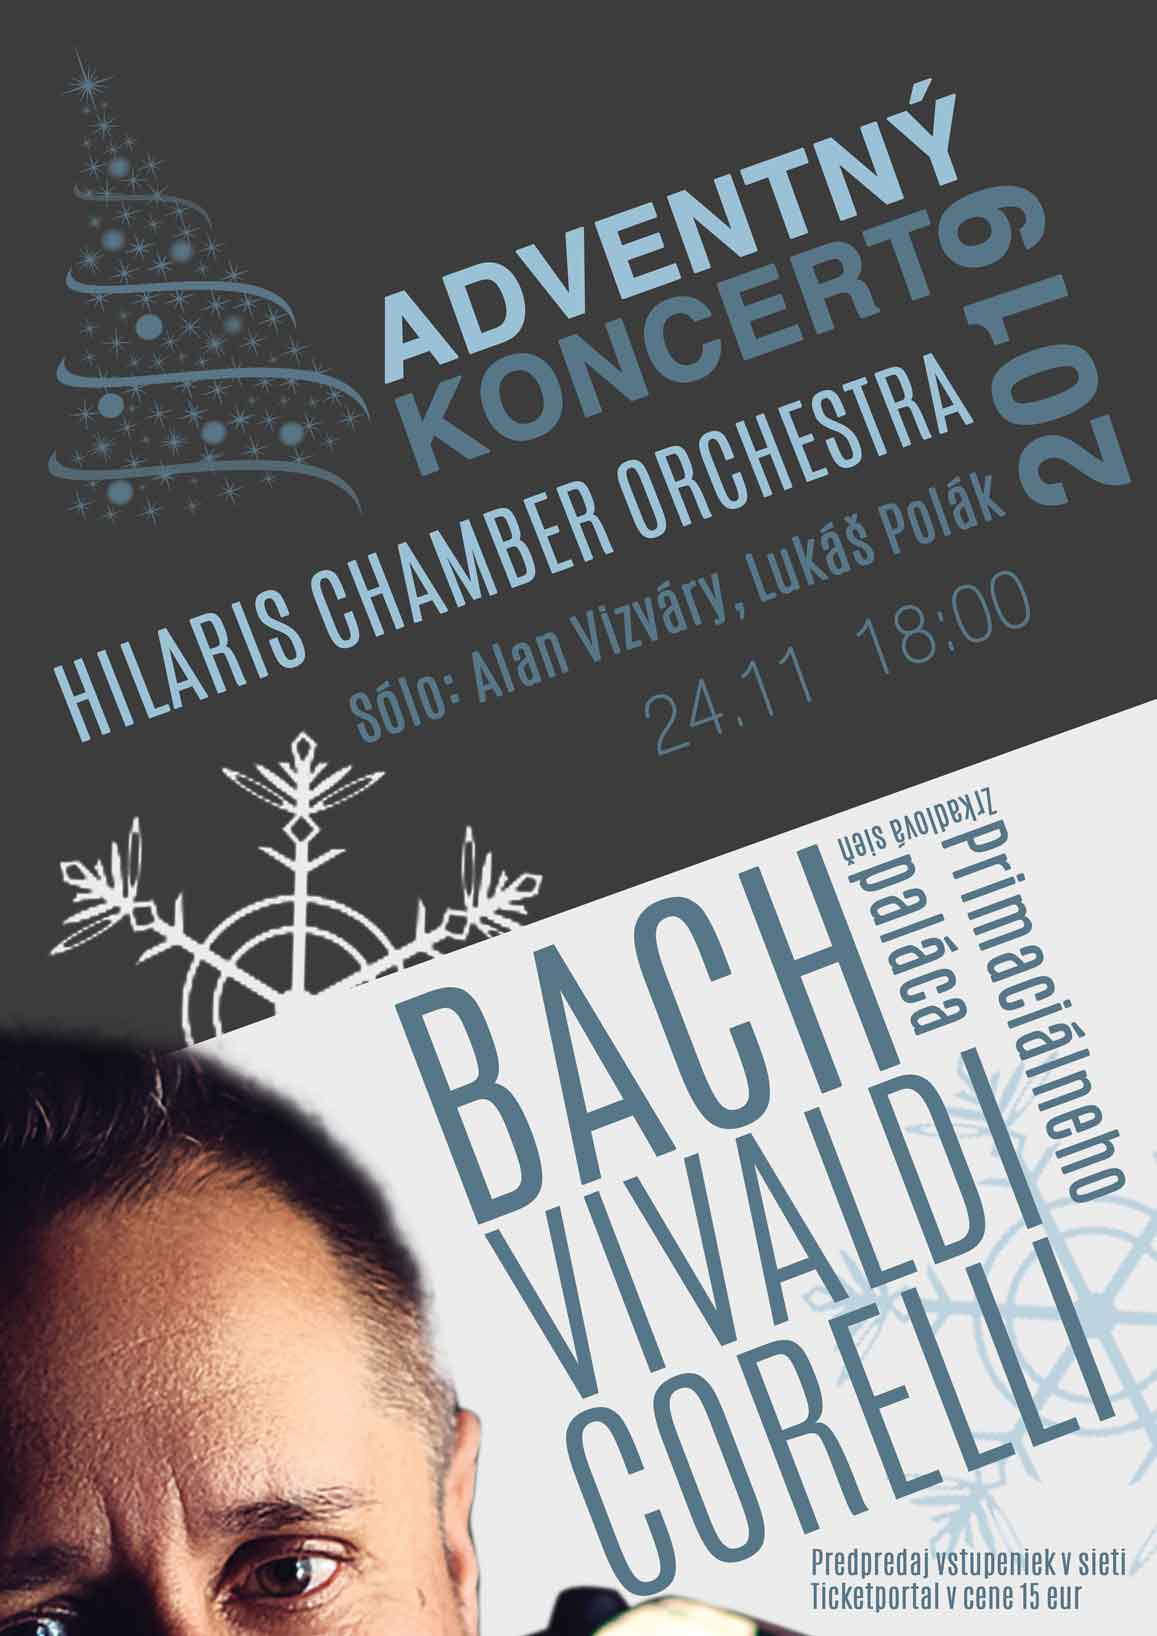 picture Adventný koncert Hilaris Chamber Orchestra